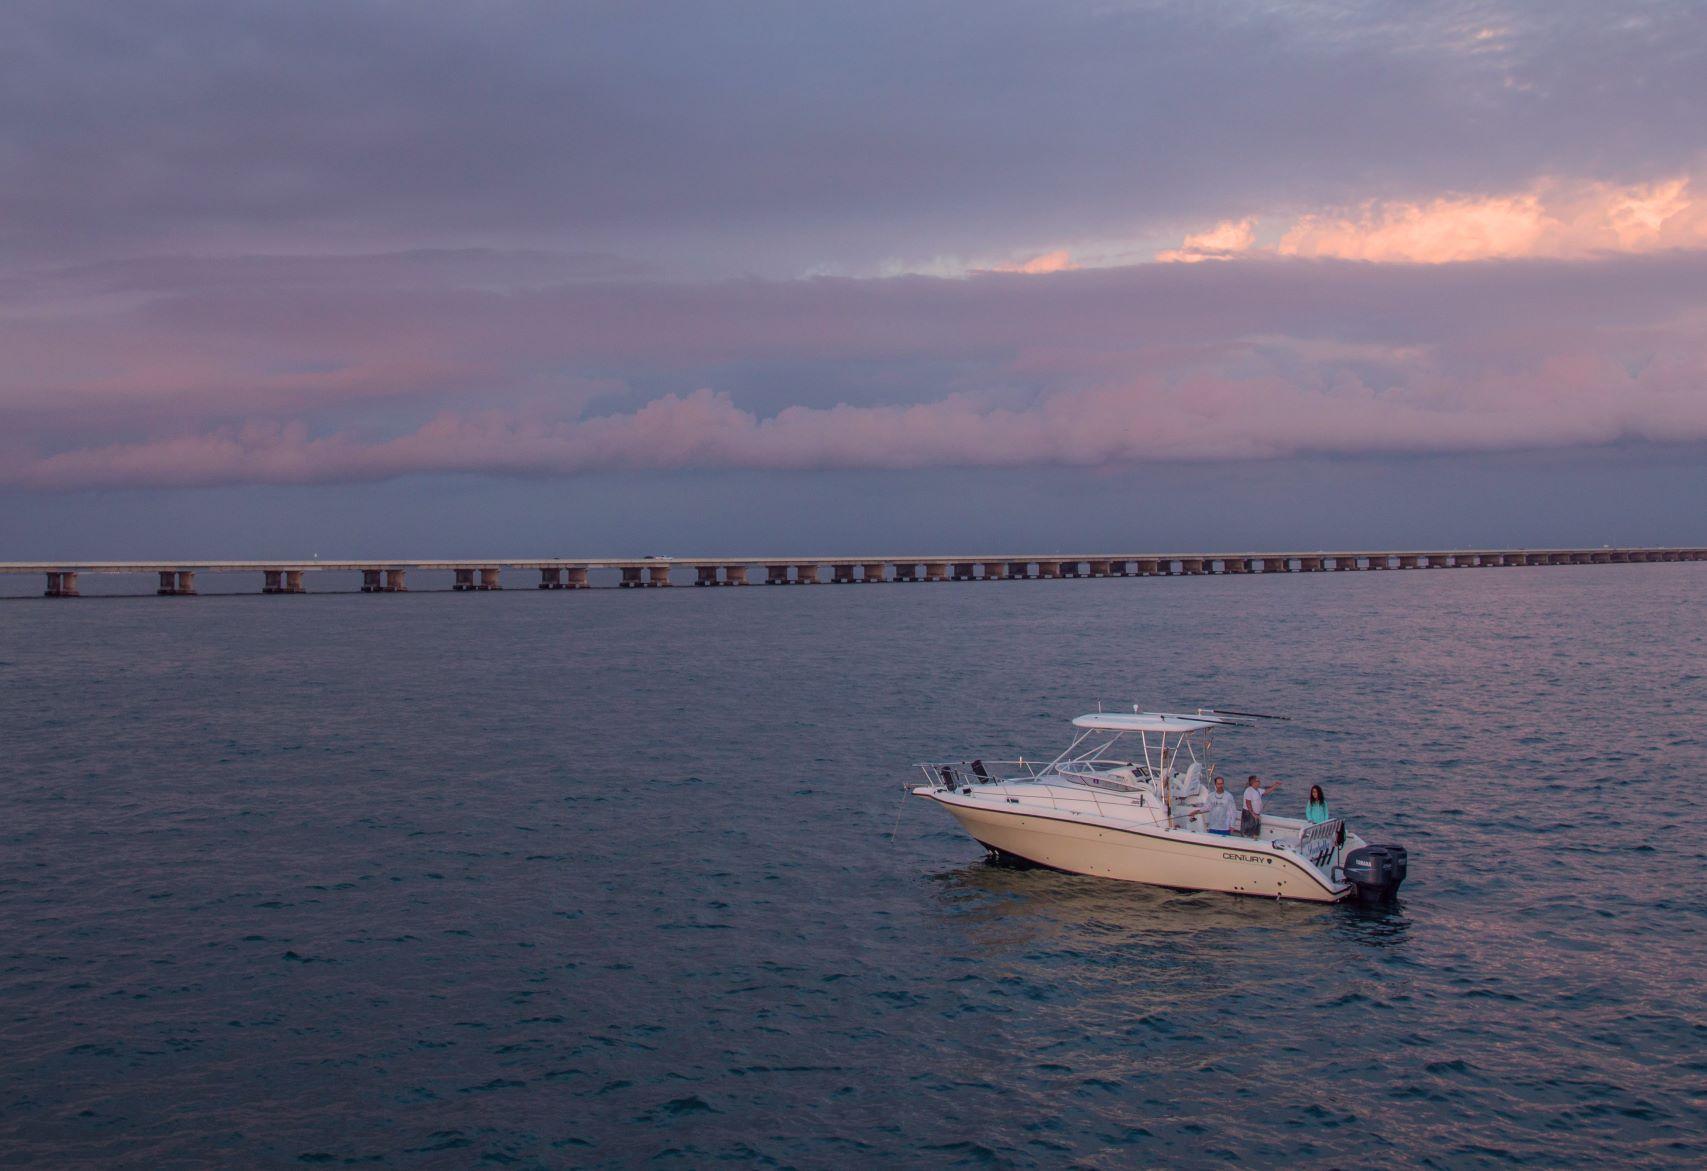 075 boat skyway brg cvt 2.jpg